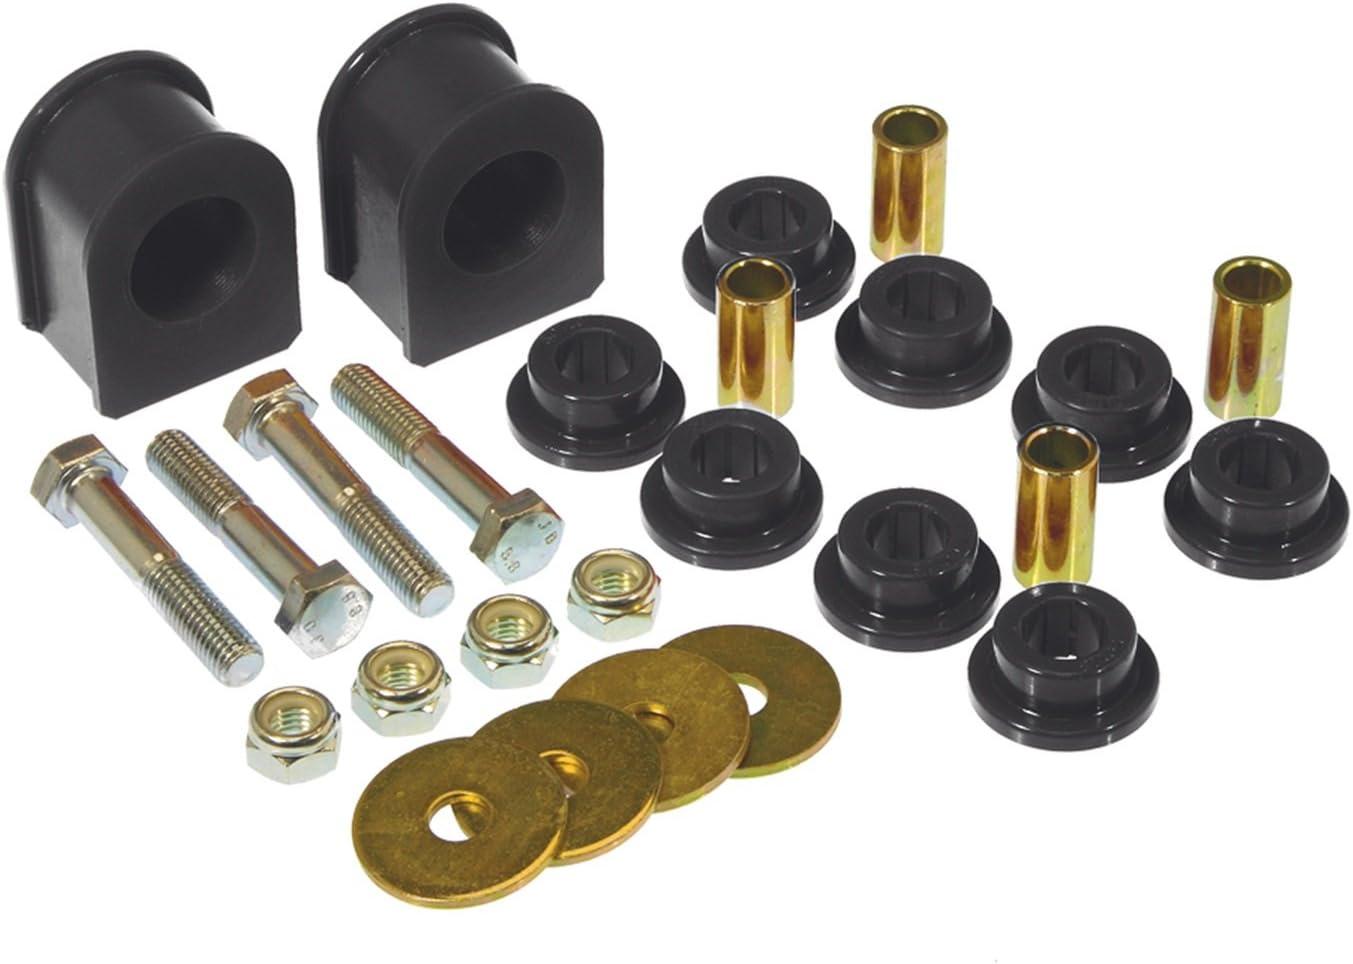 Prothane 7-1181-BL Black 23.6 mm Sway Bar Bushing Kit